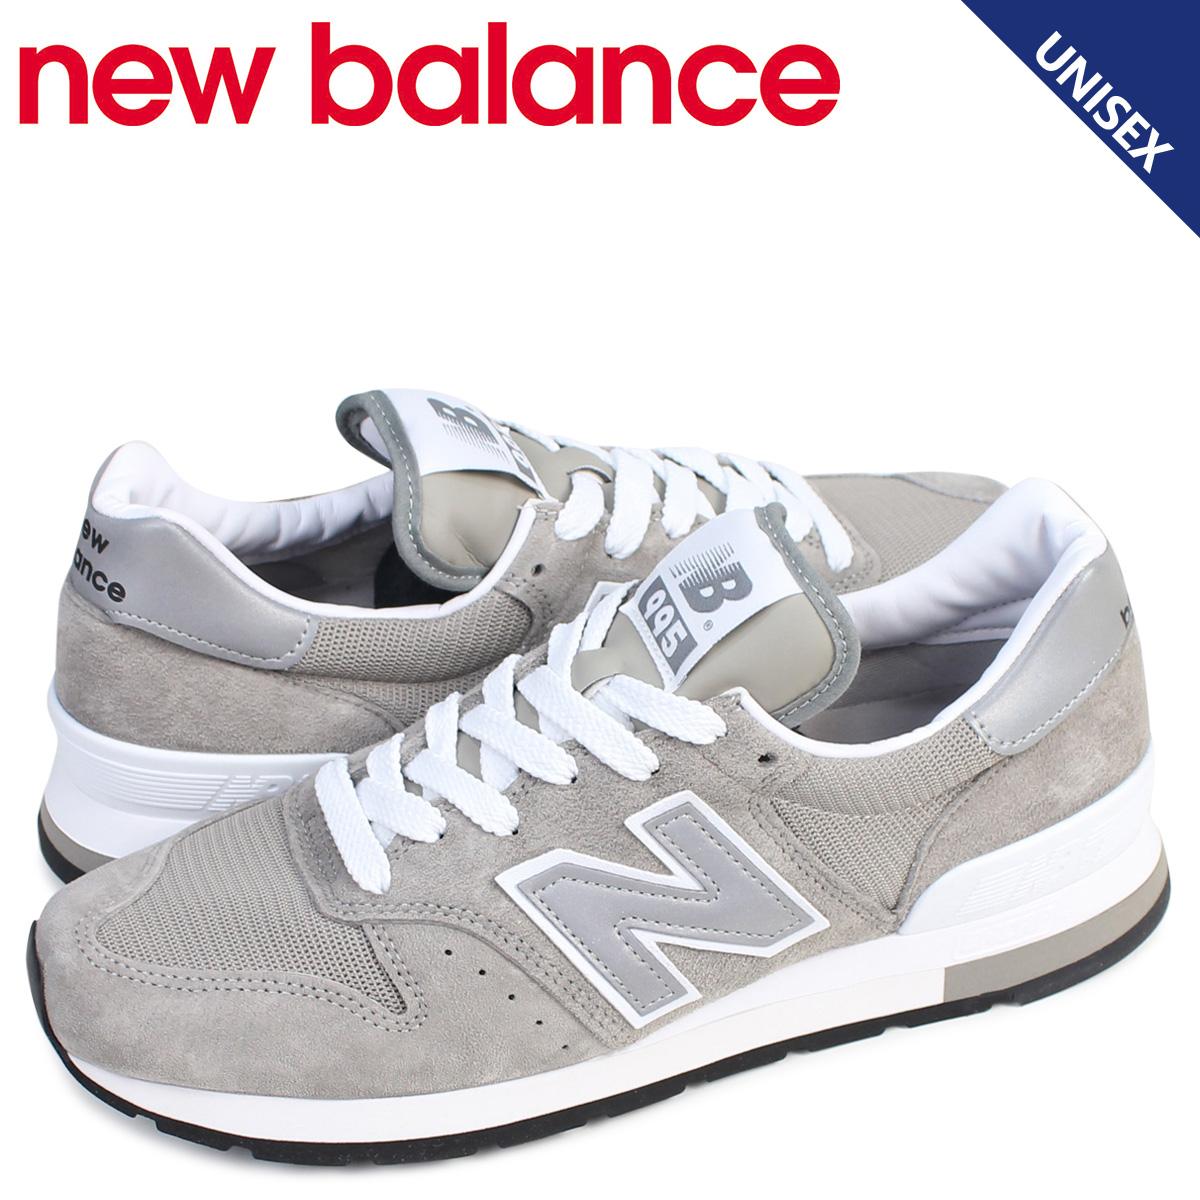 new balance 995 mens